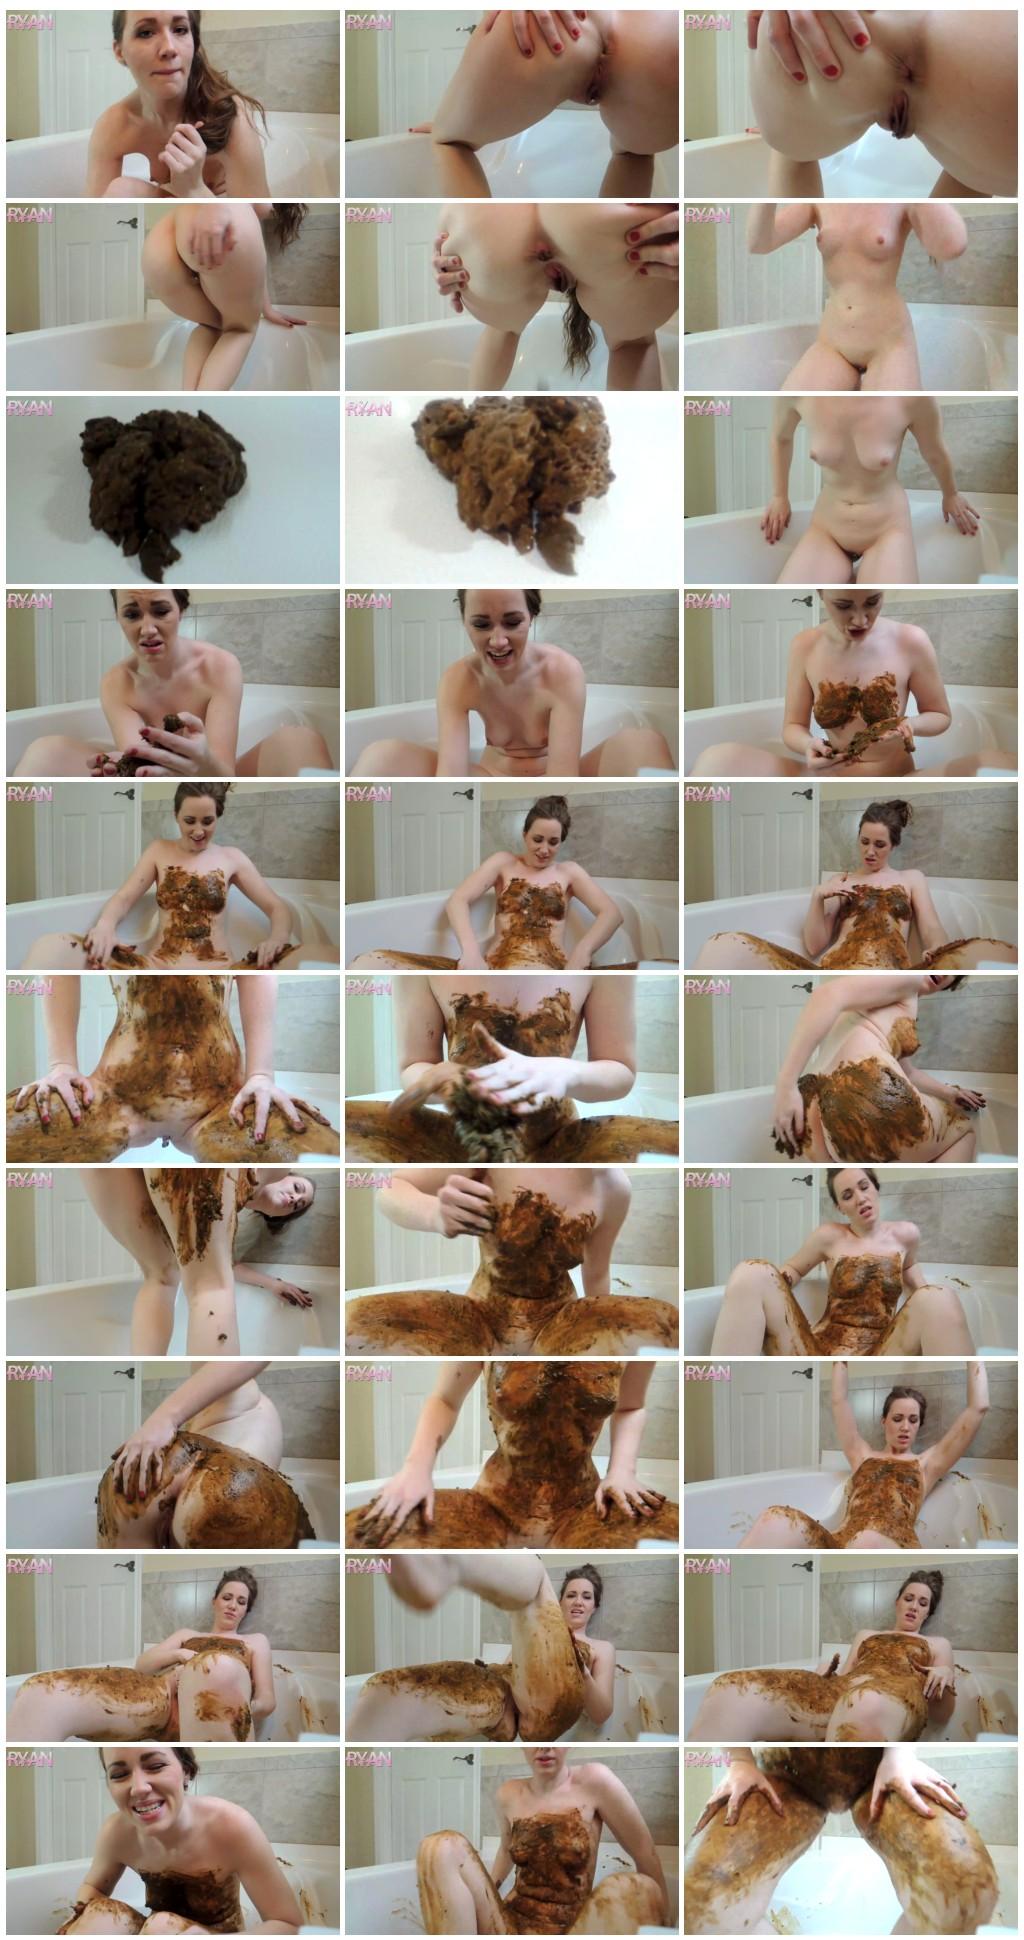 GoddessRyan.com ScatShop.com Goddess Ryan Full Body Extreme Smear in Tub Solo Scat Smearing thumb - [GoddessRyan com - ScatShop com] Goddess Ryan - Full Body Extreme Smear in Tub [ Solo, Scat, Smearing]